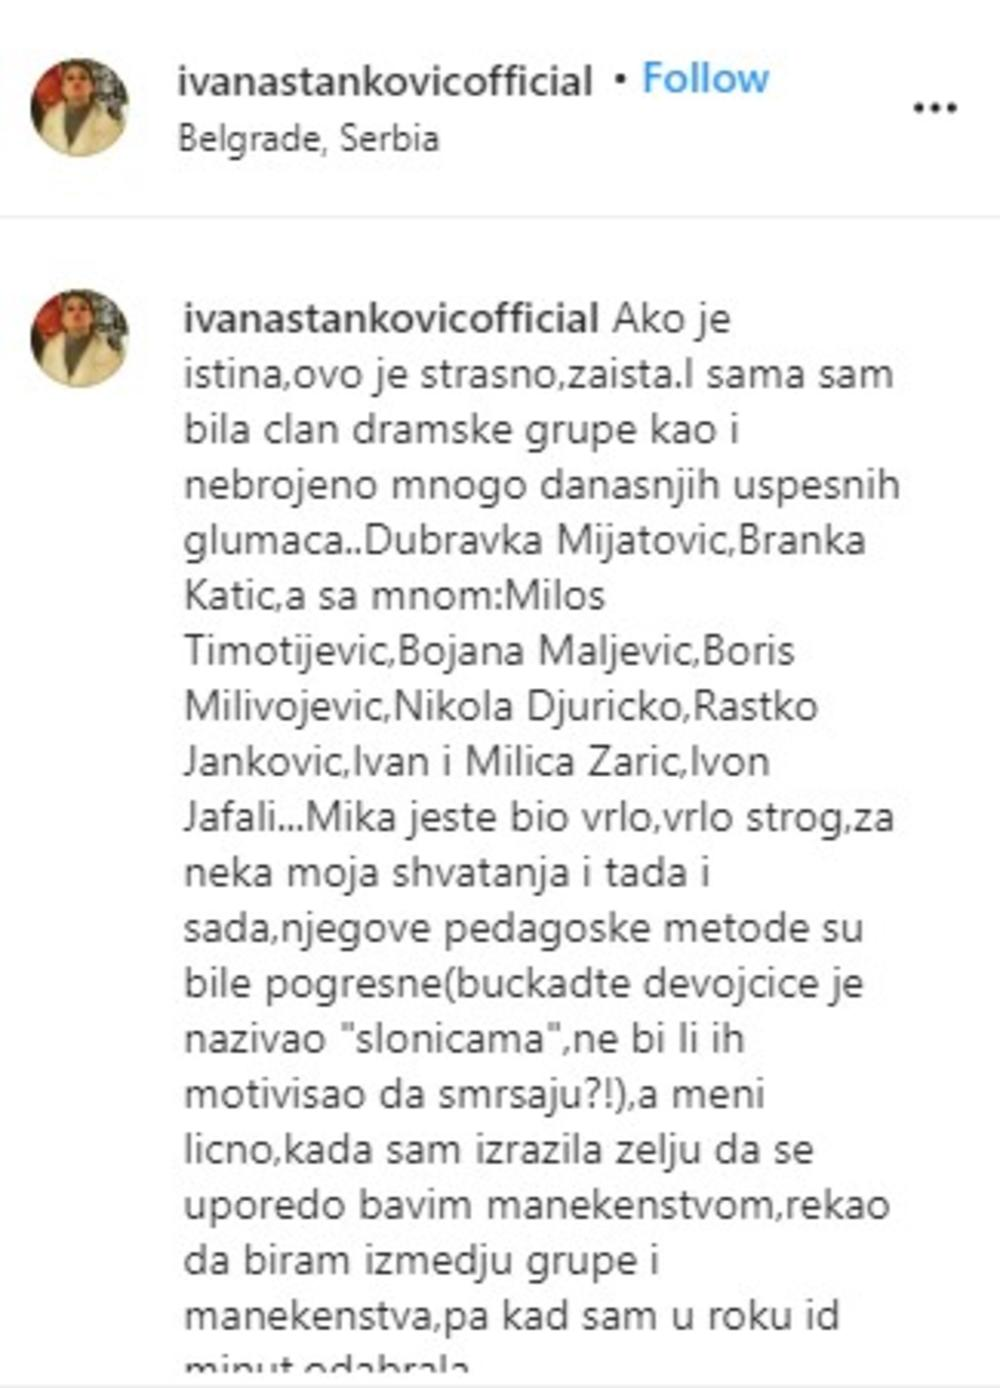 Ivana Stanković, Miroslav Mika Aleksić